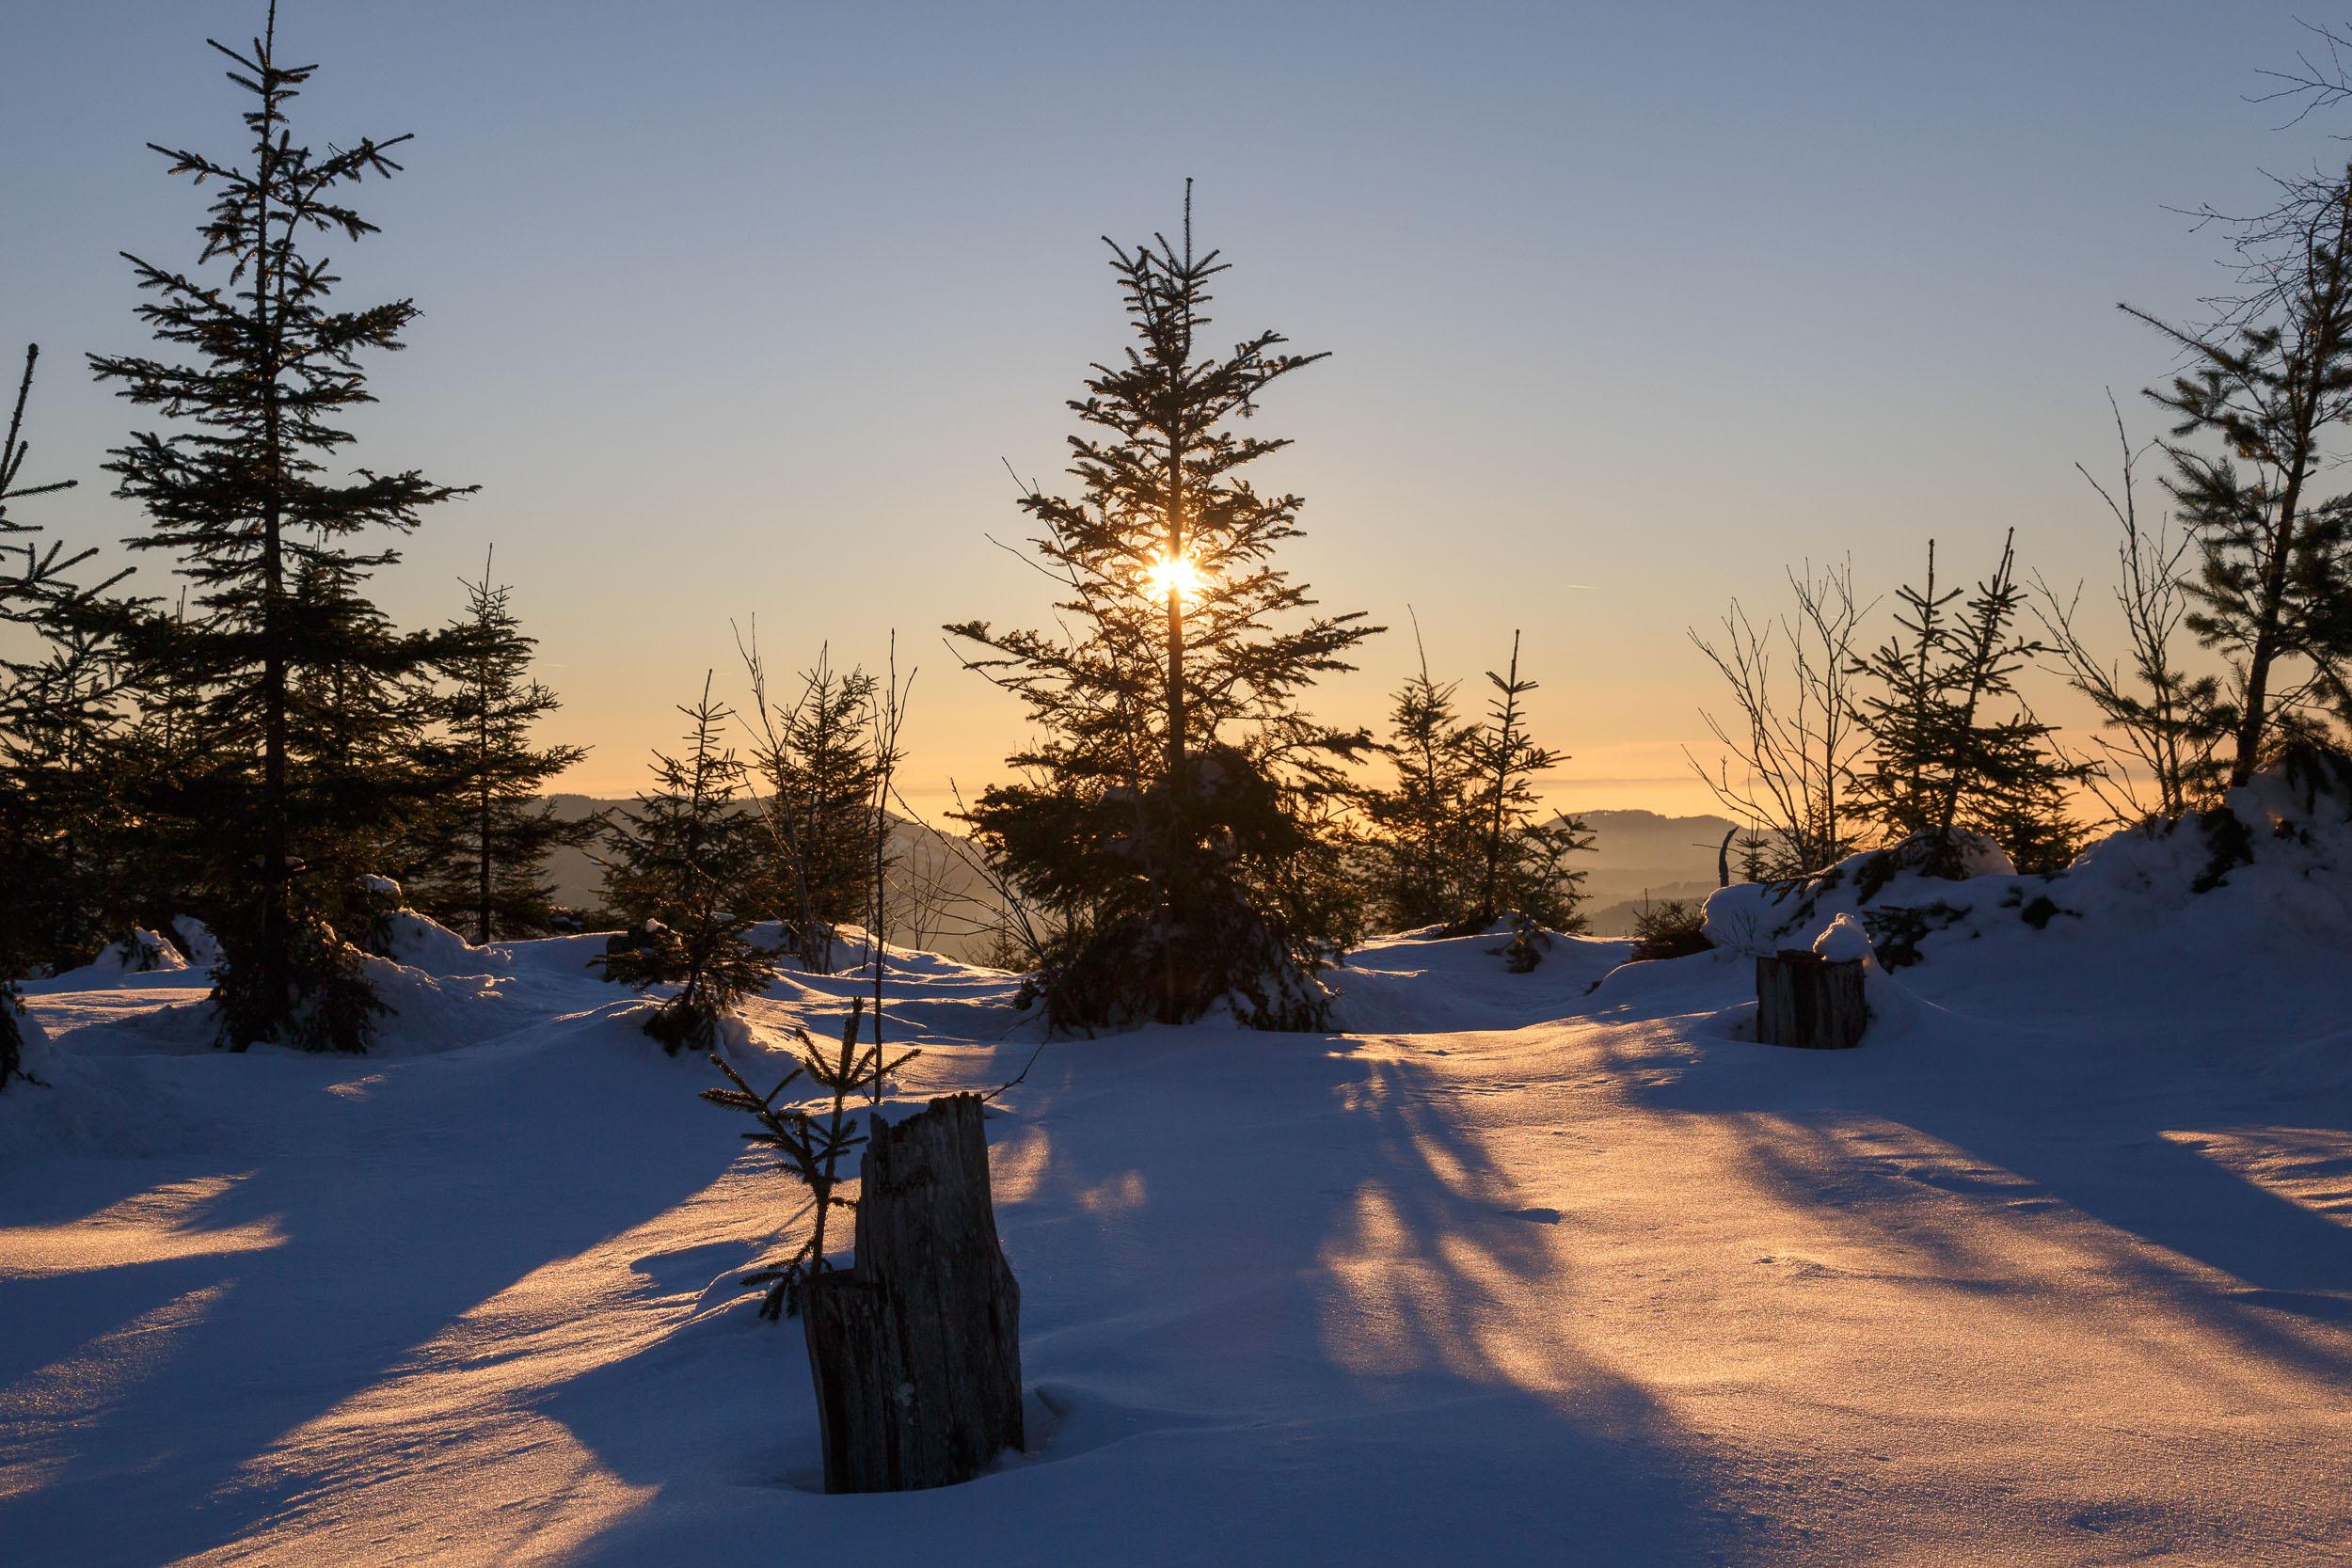 150212_winter_galerie_03.jpg